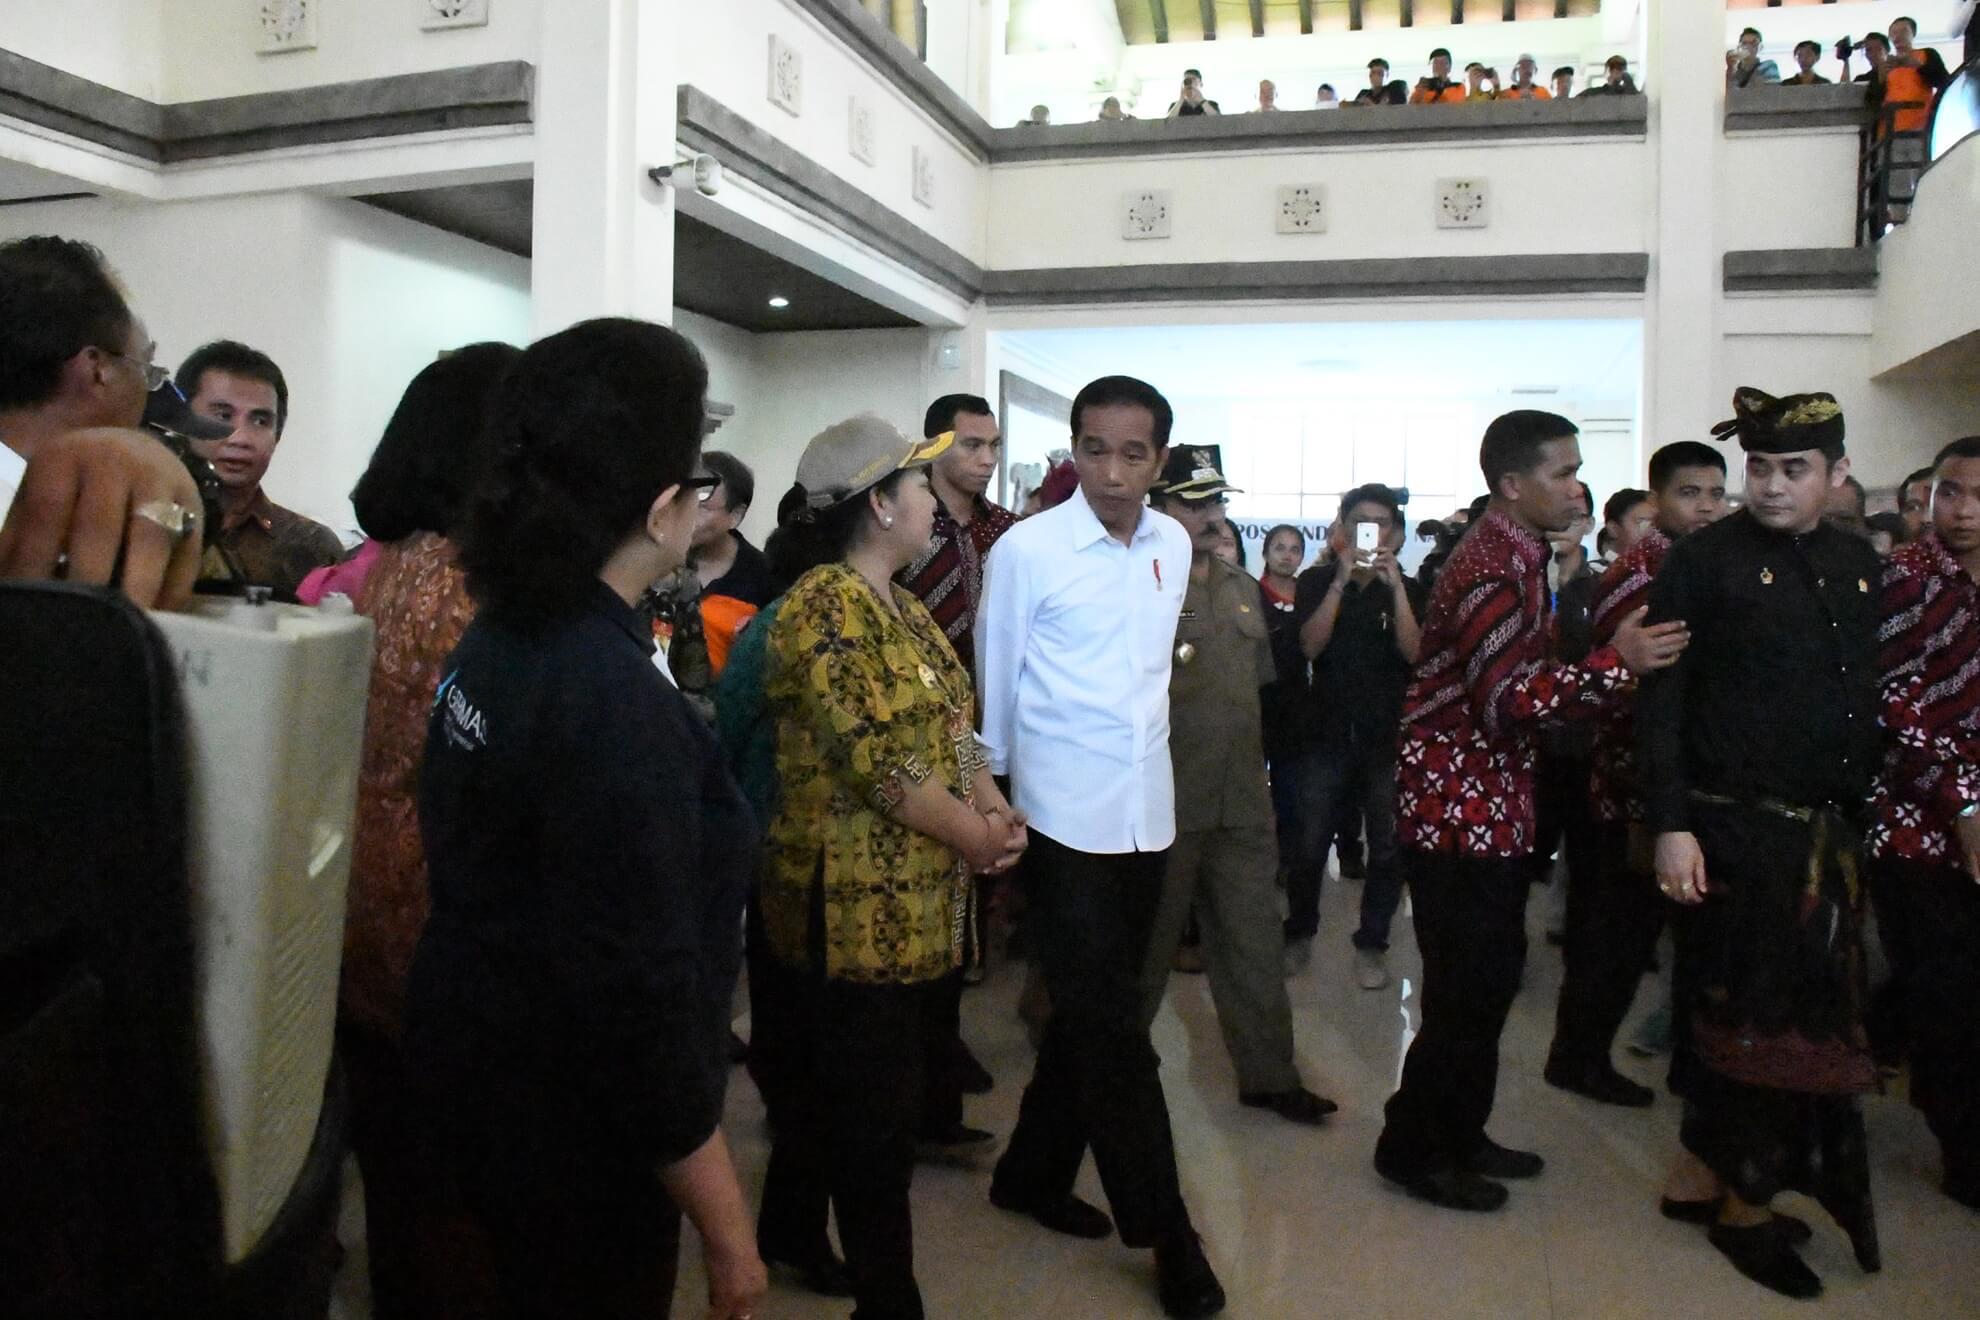 presiden-jokowi-dan-kabinet-kerja-meninjau-kesiapan-logistik-di-pos-komando-bencana-gunung-agung-desa-karangasem-jpg-4